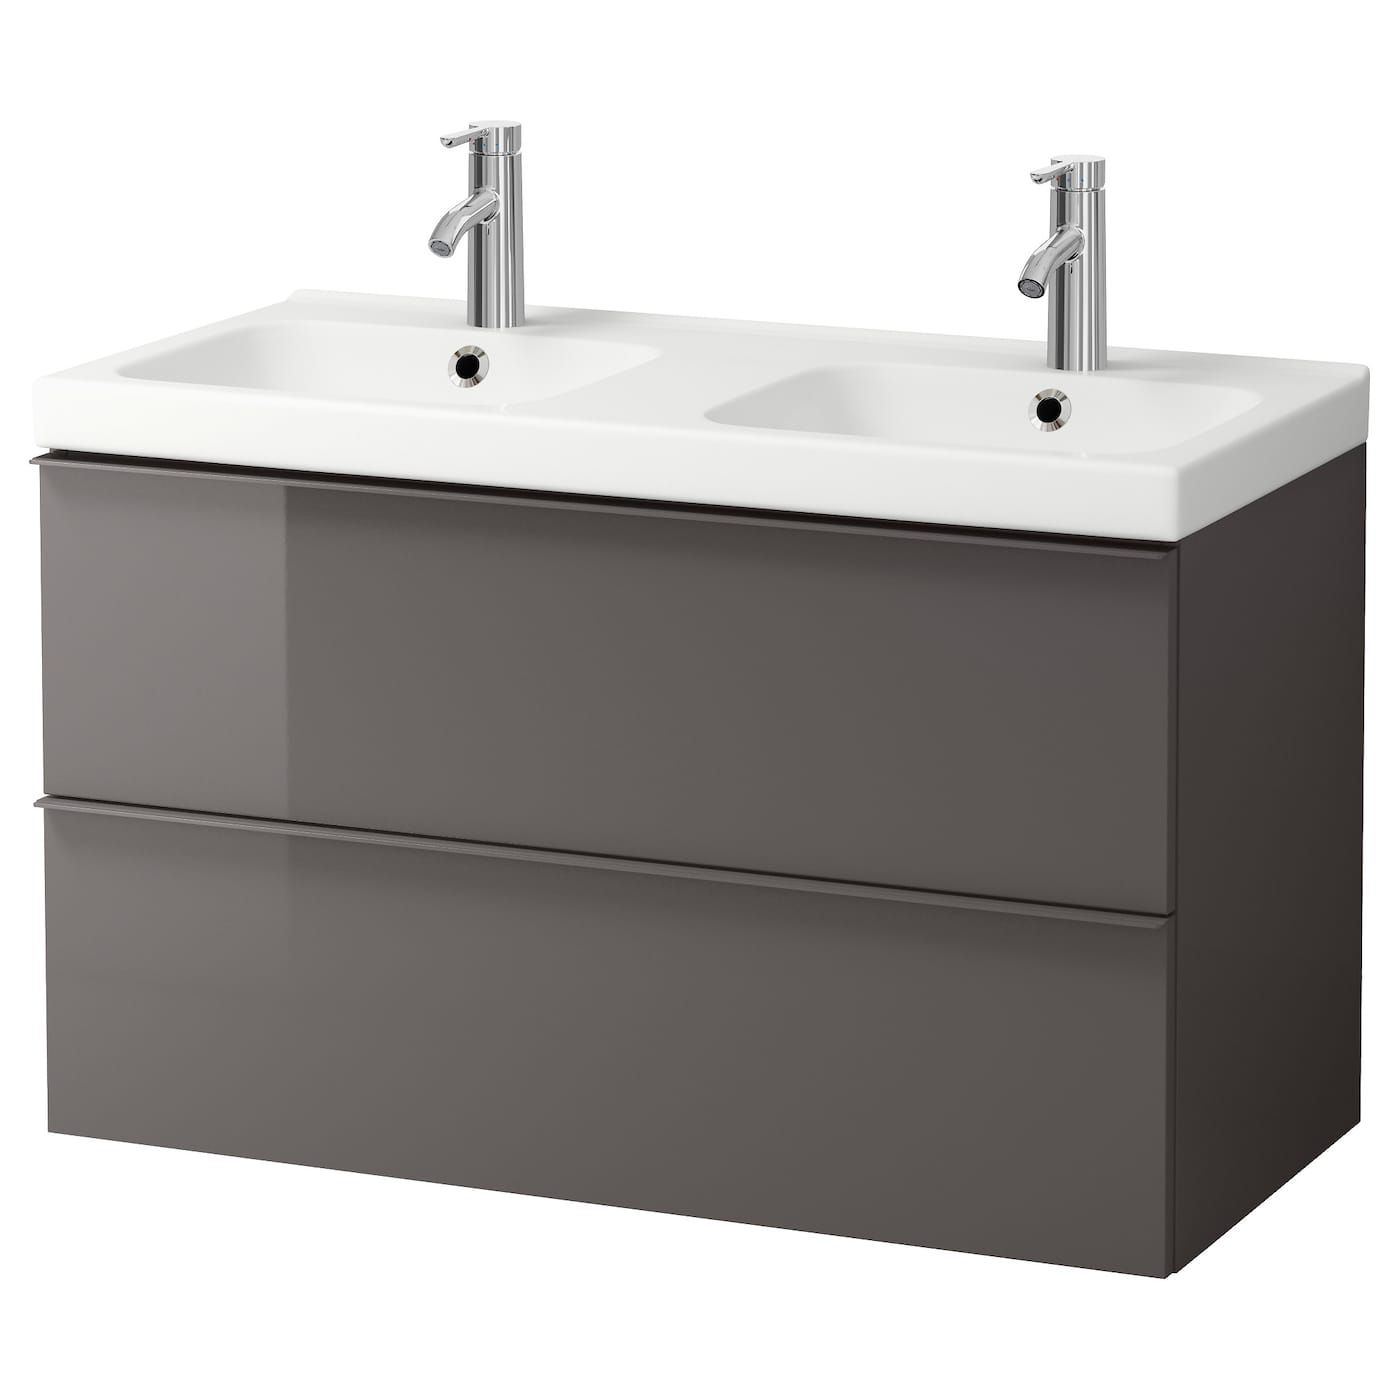 Buy Furniture Malaysia Online Furniture Home Ideas Sink Cabinet Ikea Godmorgon Blue Bathroom Accessories